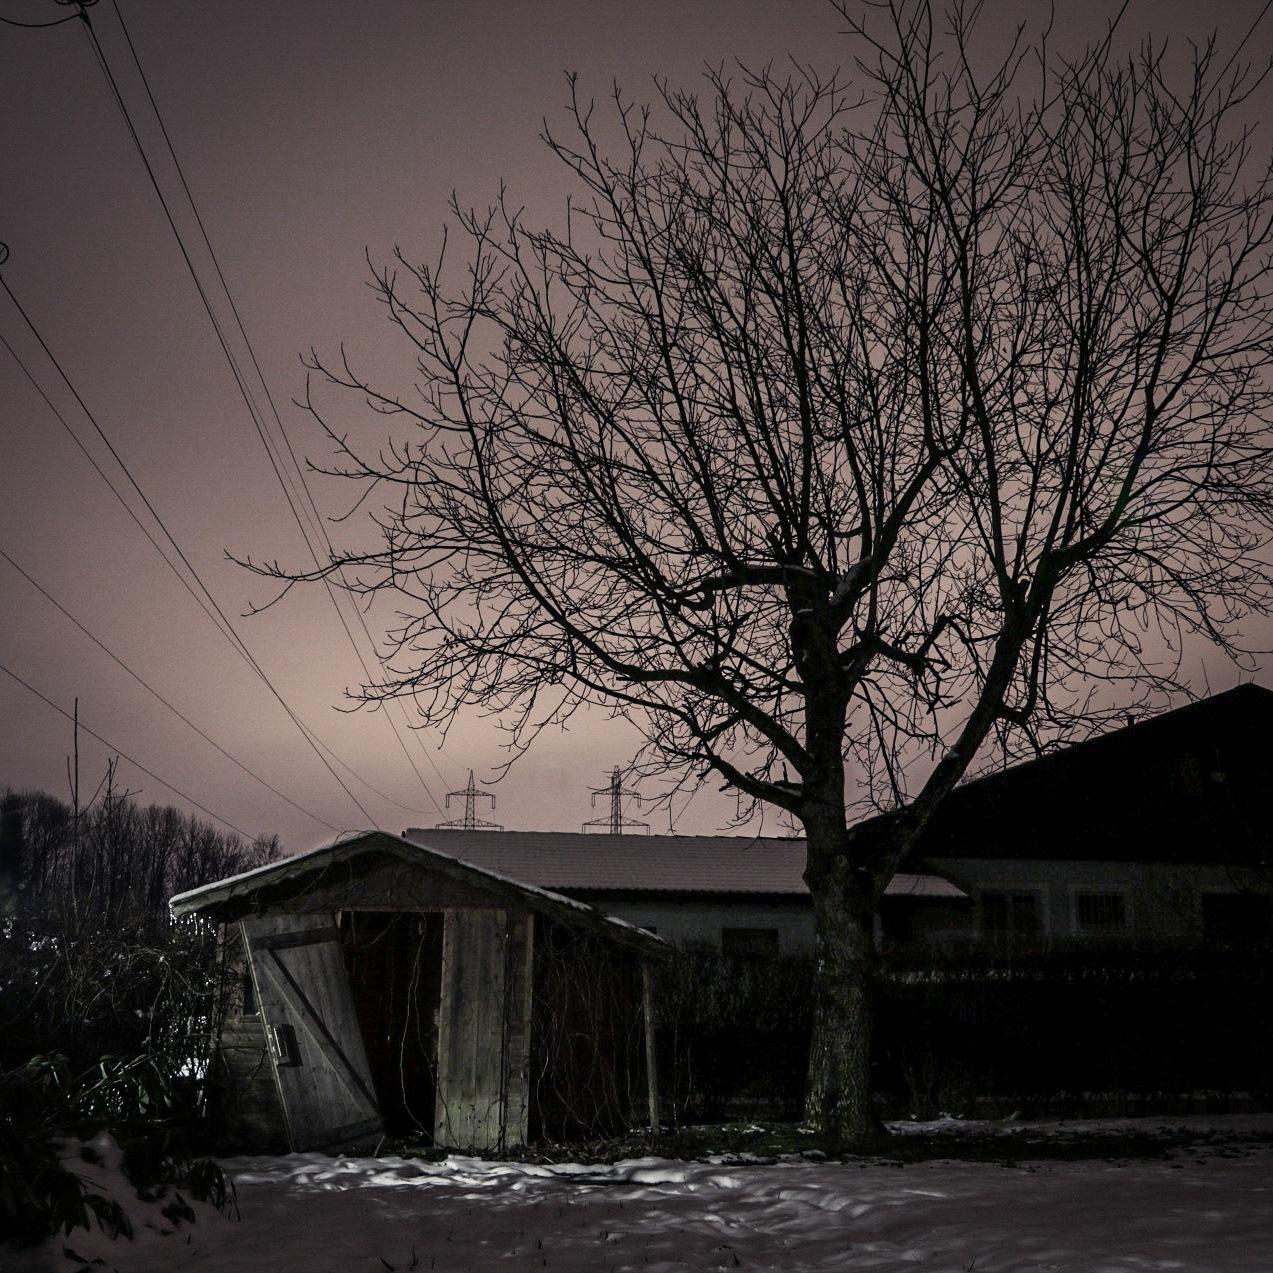 Gloomy Vibes  by Joni Hesse